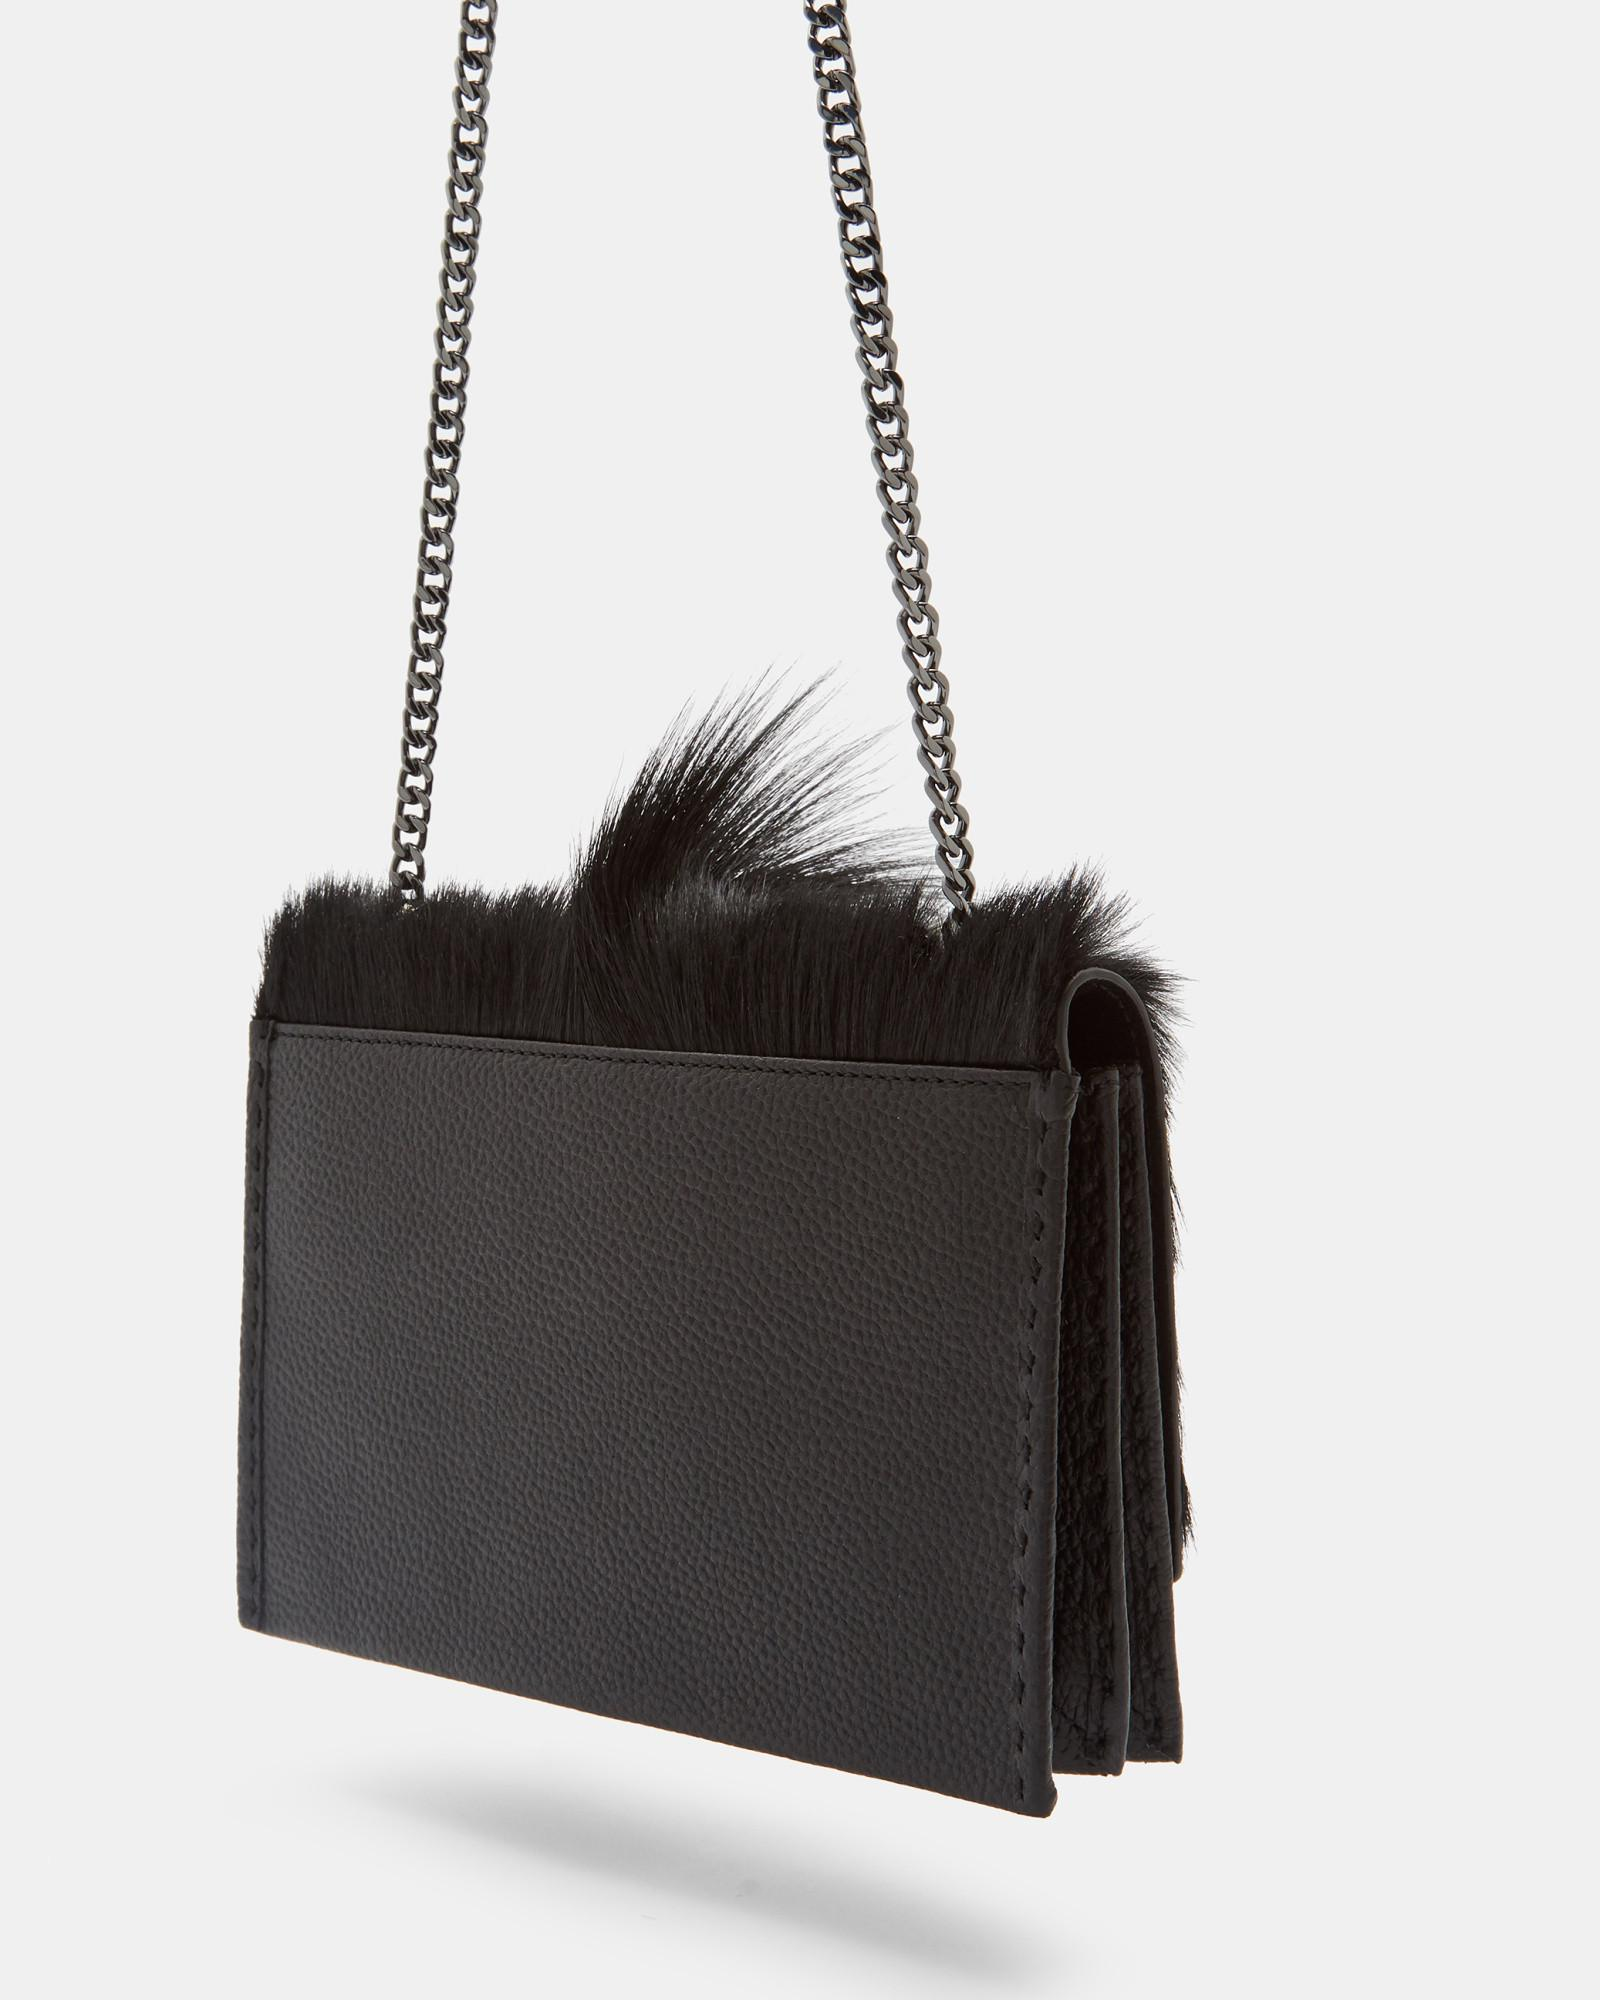 bd25d3cea Ted Baker Springbok Leather Concertina Cross Body Bag in Black - Lyst